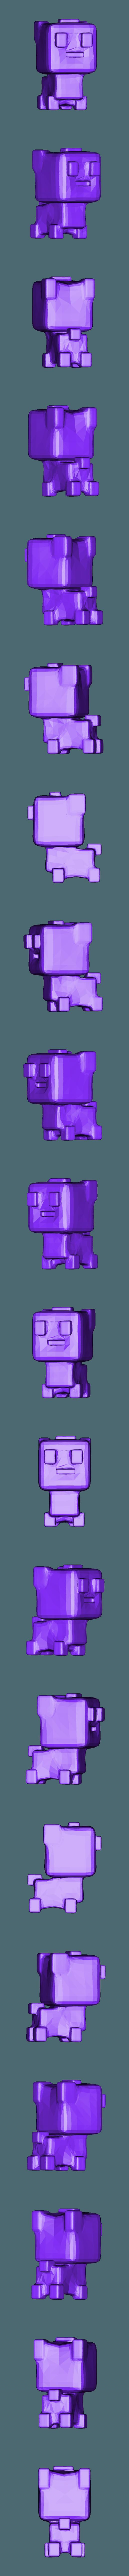 dog.stl Download free STL file test print cube dog, test print cube dog • 3D printer object, gaaraa